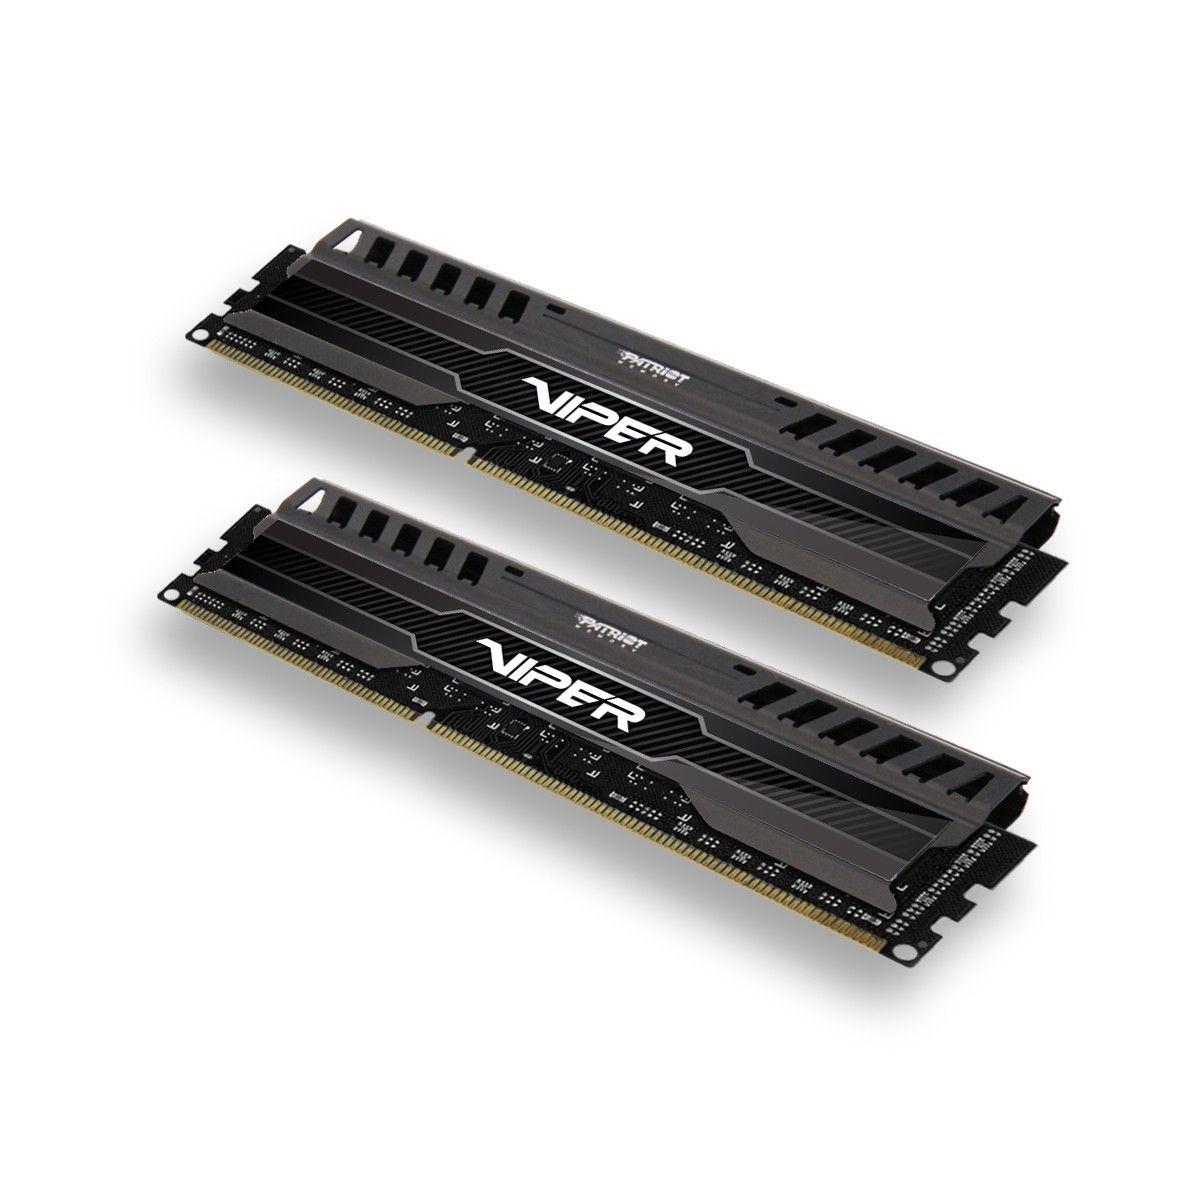 Patriot ViperX 3RD 2x8GB DDR3 1600MHz CL9 1.5V, XMP 1.3 Dual Channel